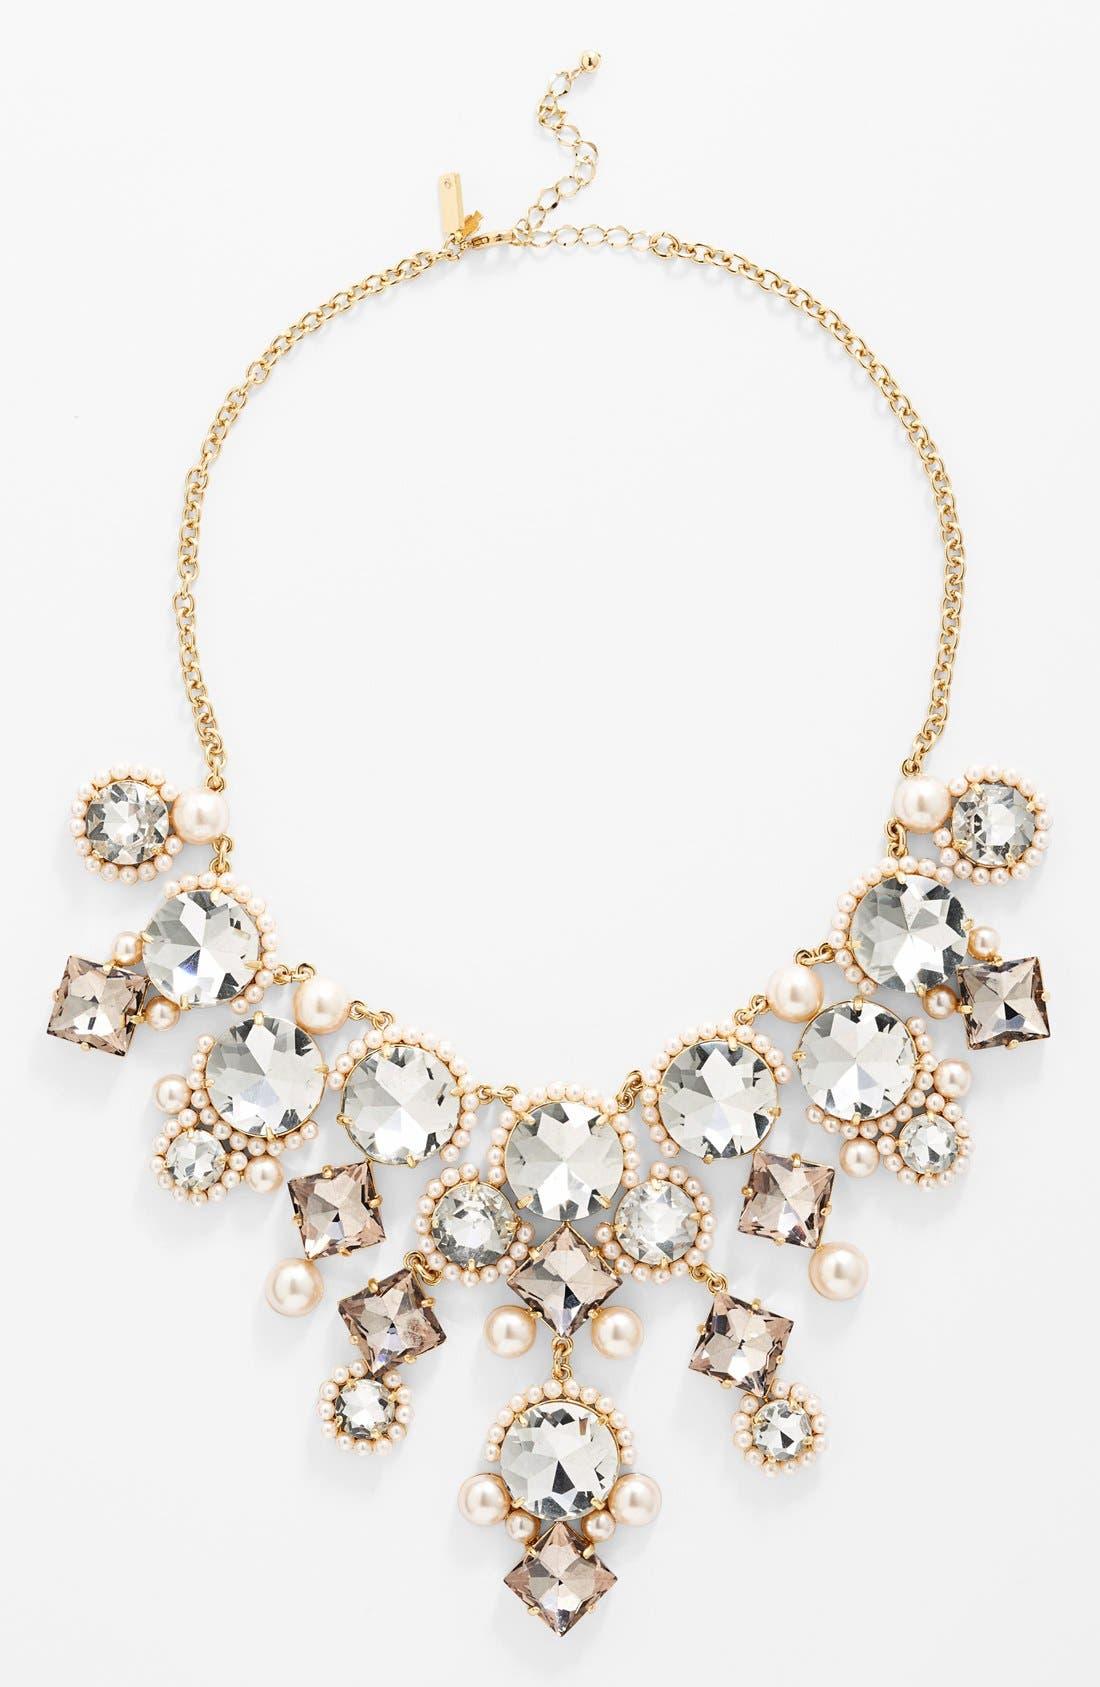 Main Image - kate spade new york 'palace gems' bib necklace